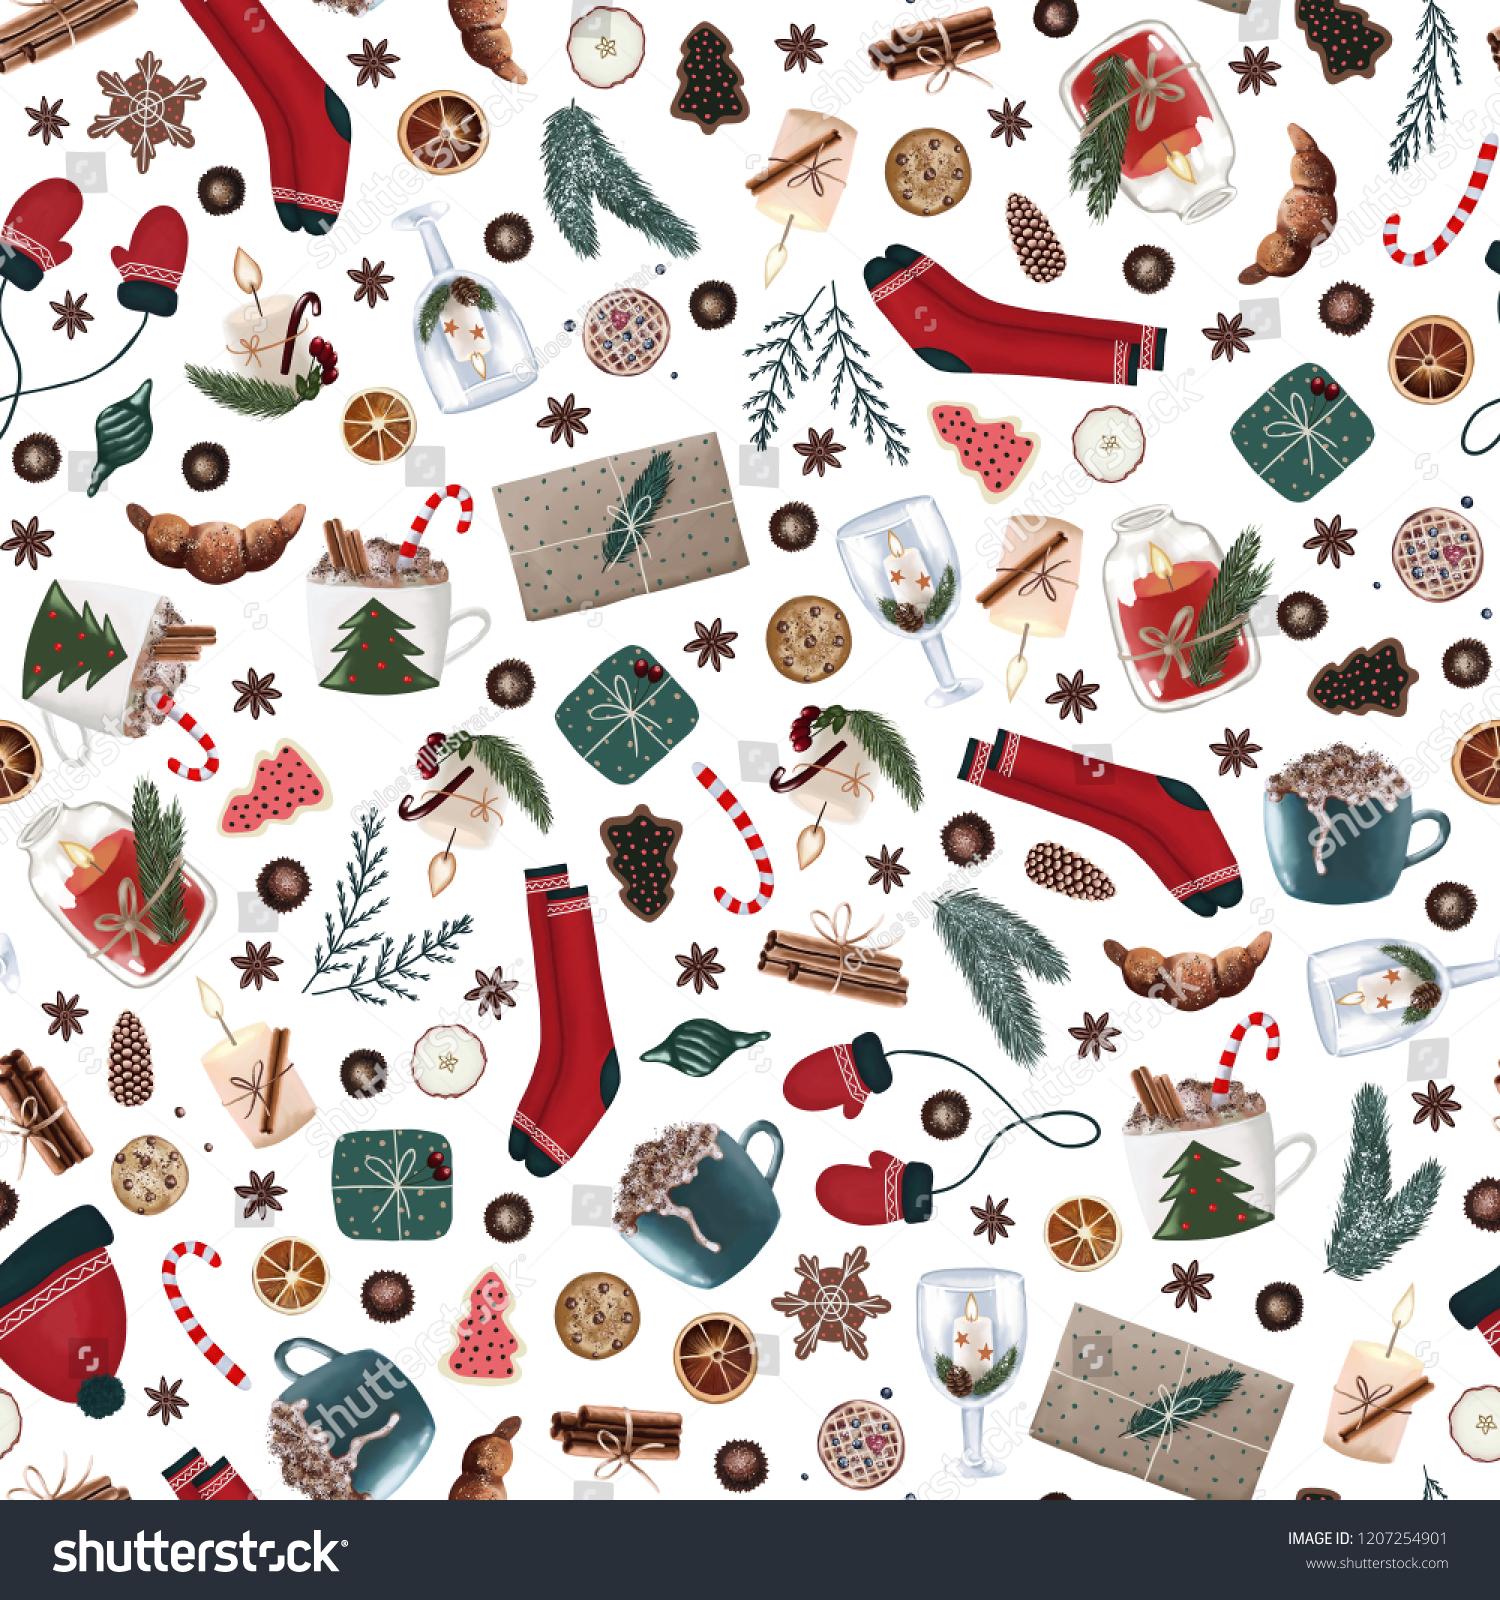 stock-photo-hygge-christmas-seamless-pat